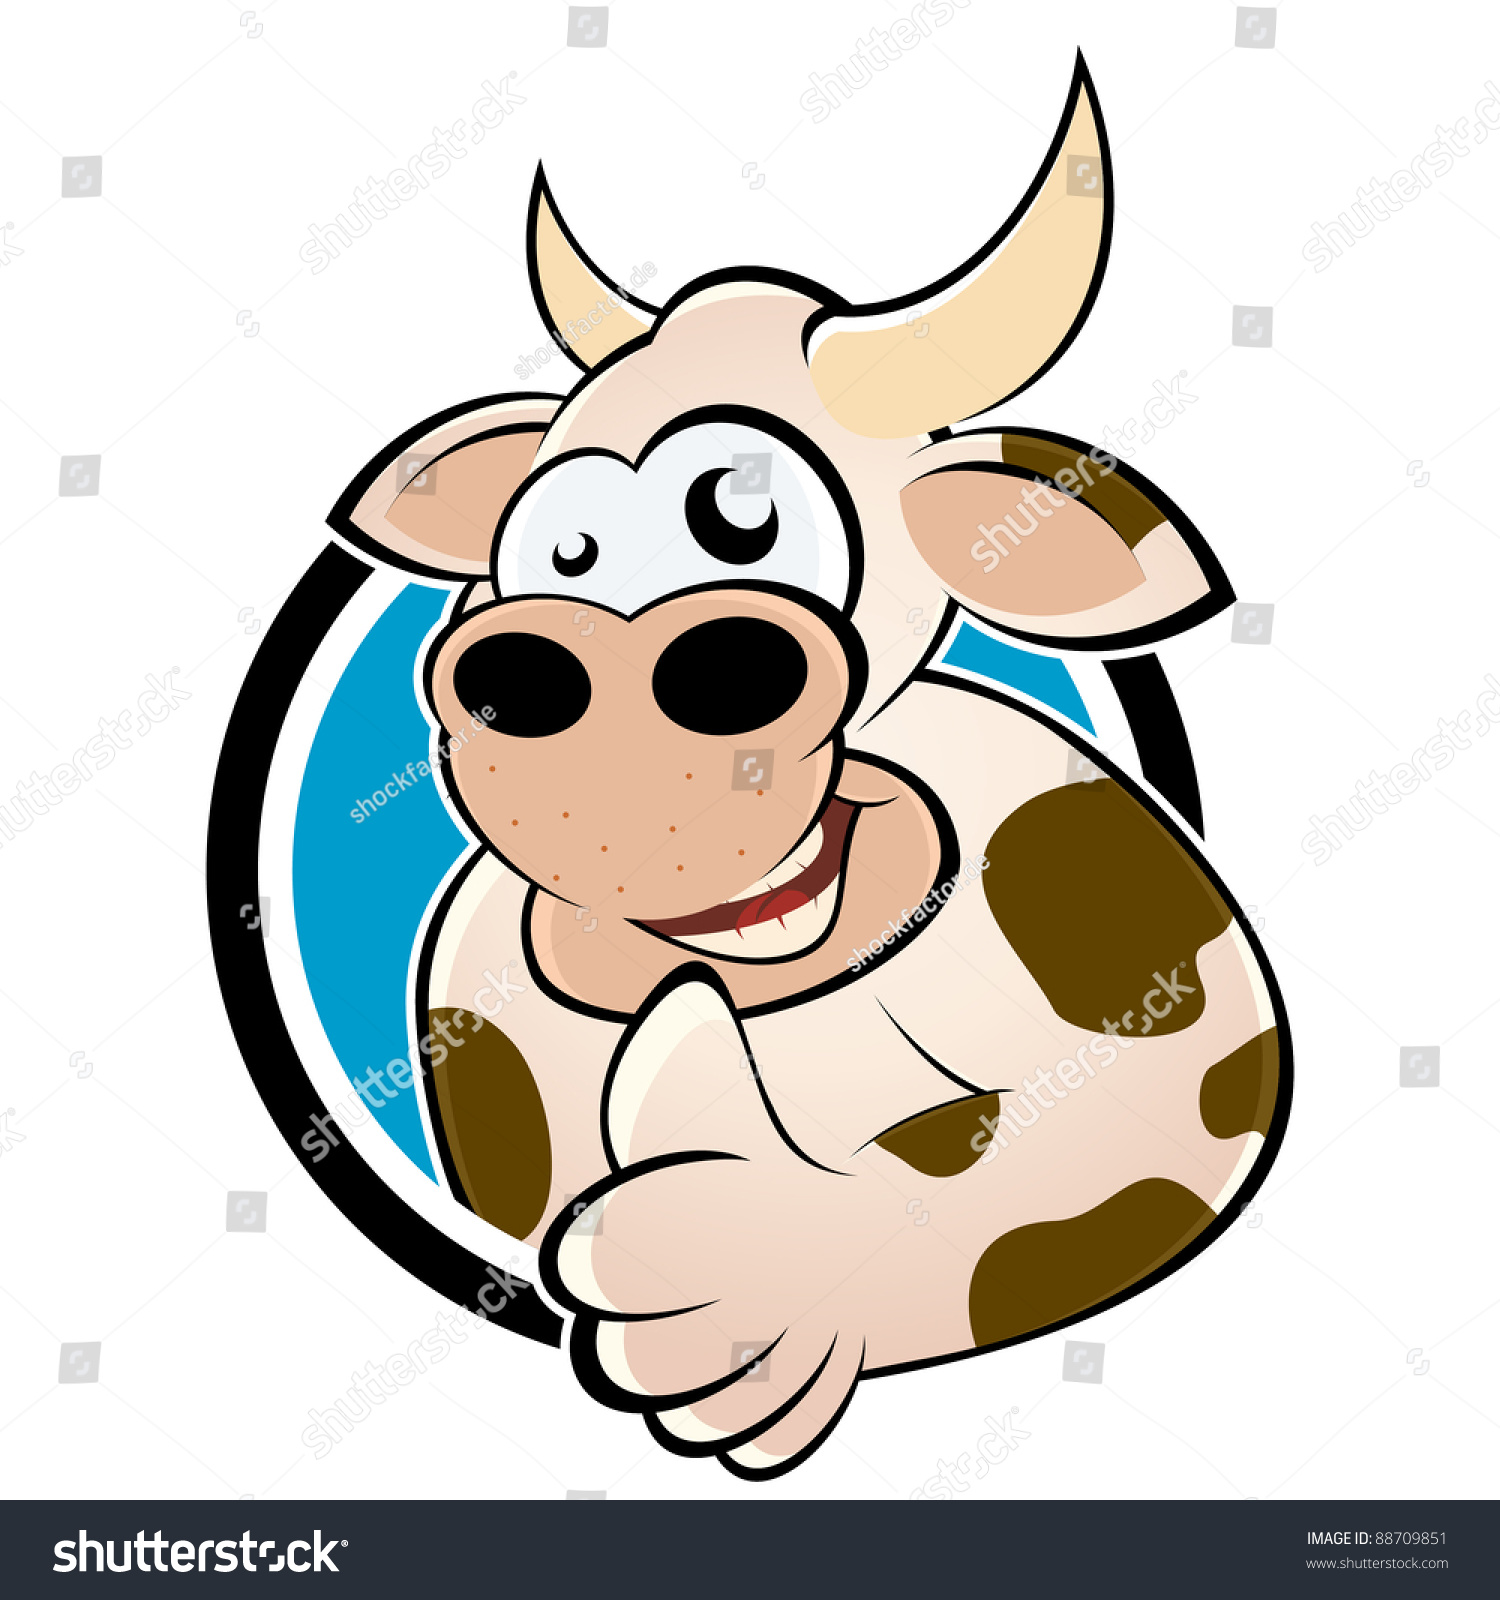 funny cartoon cow stock vector 88709851 shutterstock